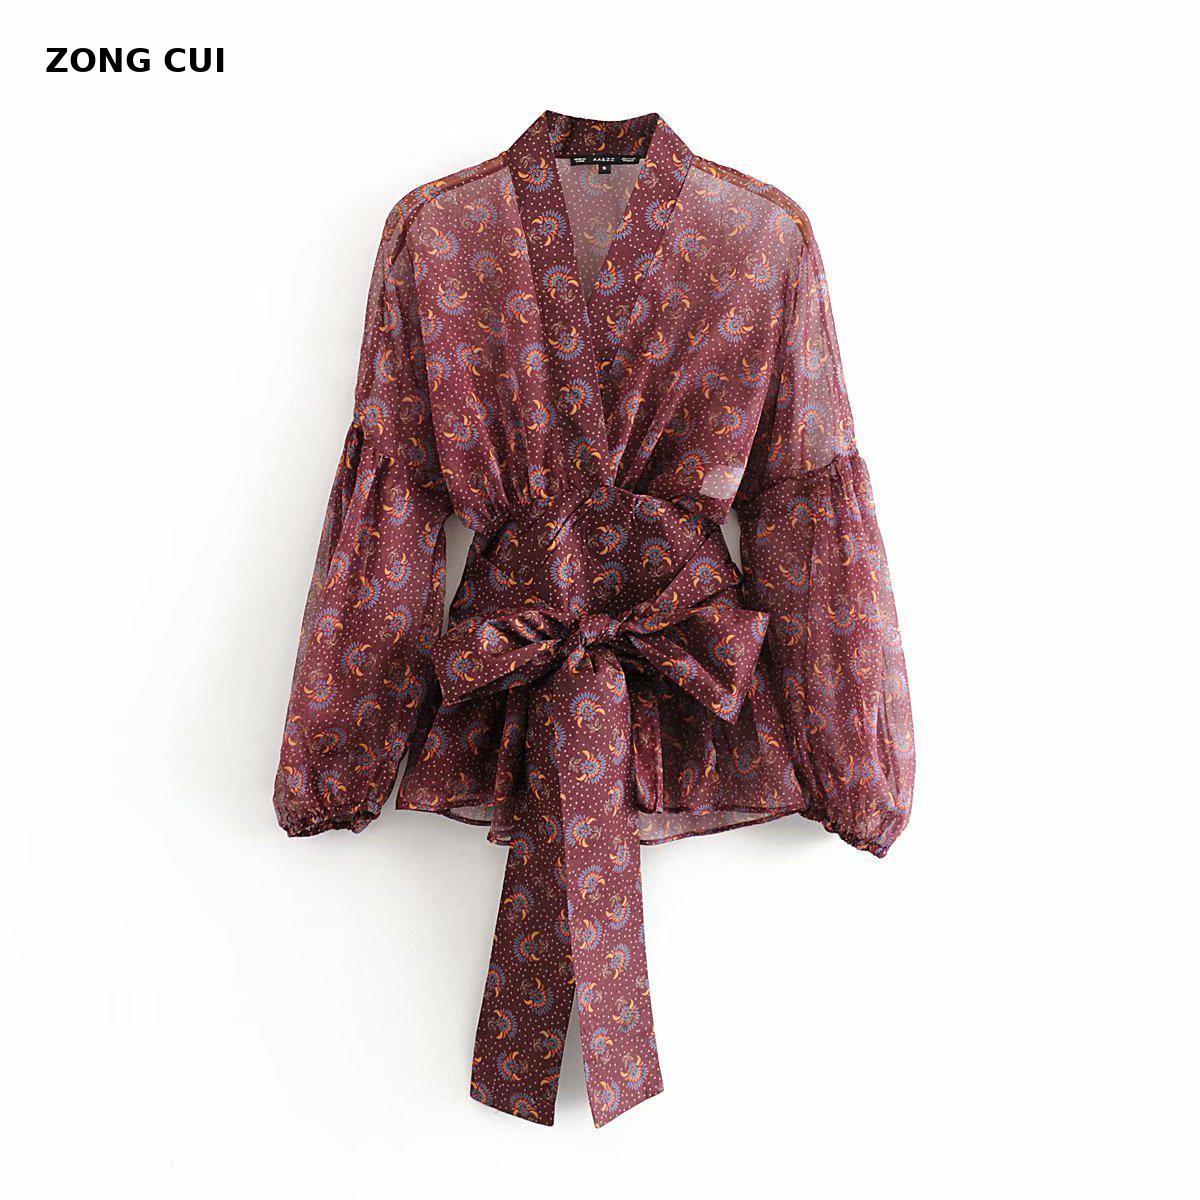 Blush ladies elegant xuef blouse, spring Spanish style, bohemian long sleeved V collar, wine red printed shirt coat.